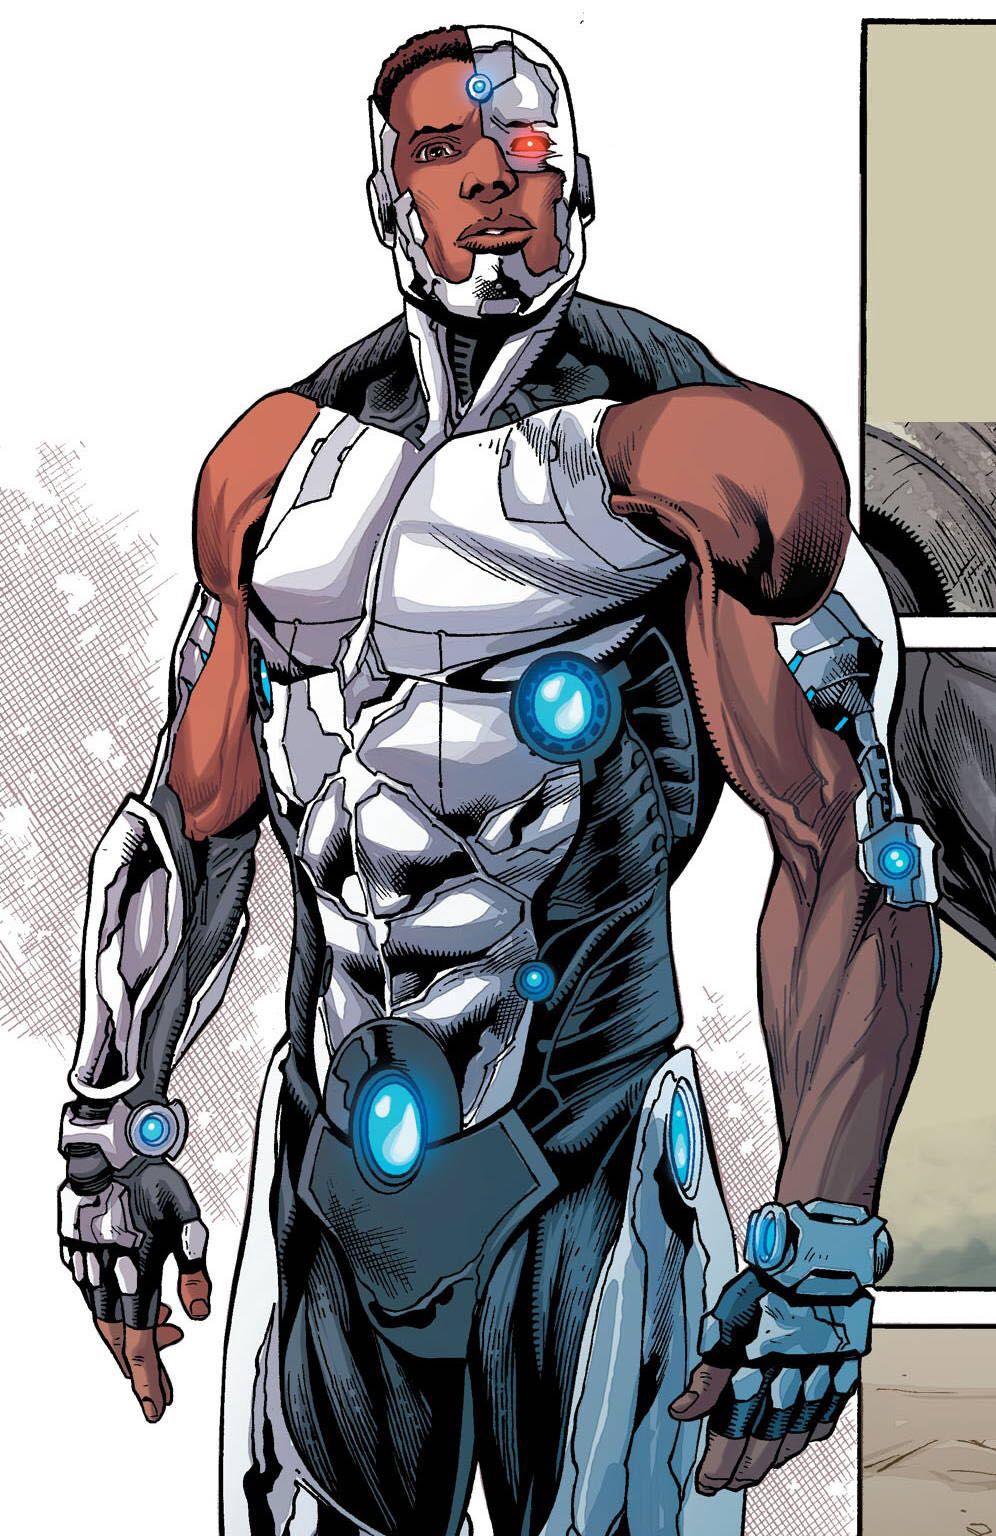 dc fanfiction - cyborg x reader - wattpad